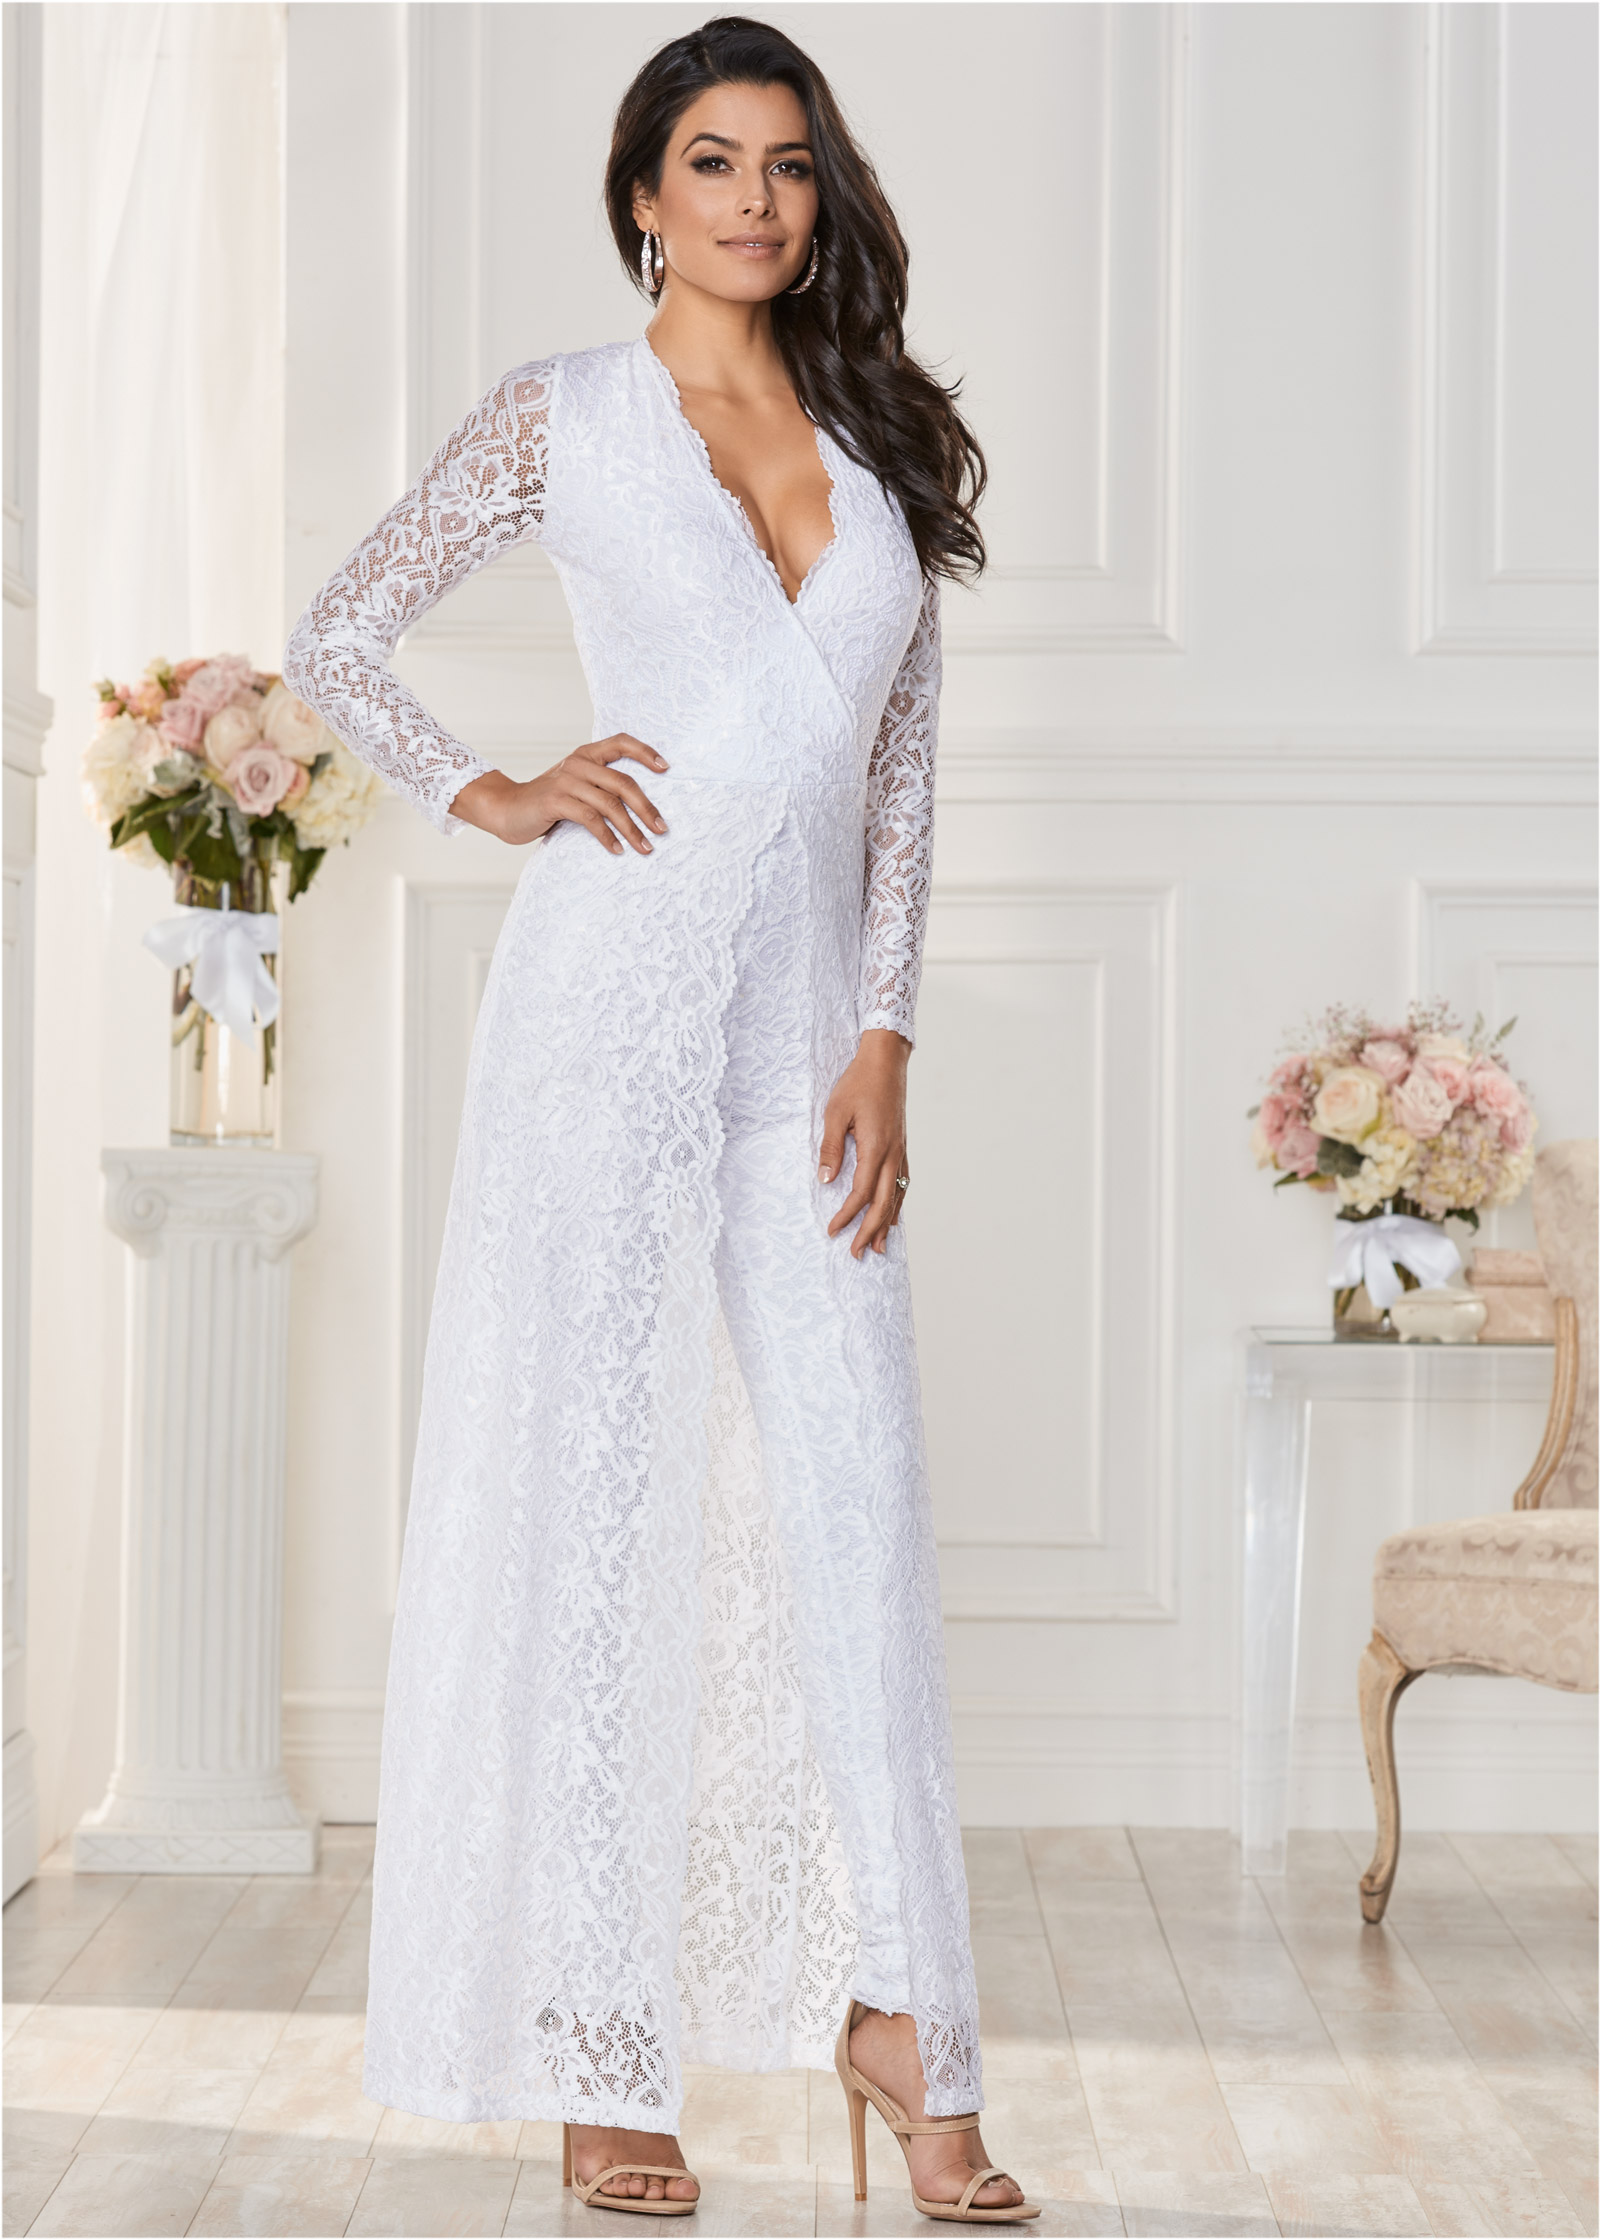 f957e3fd15c9 Plunging lace jumpsuit in white venus jpg 527x738 Wedding white lace  jumpsuit